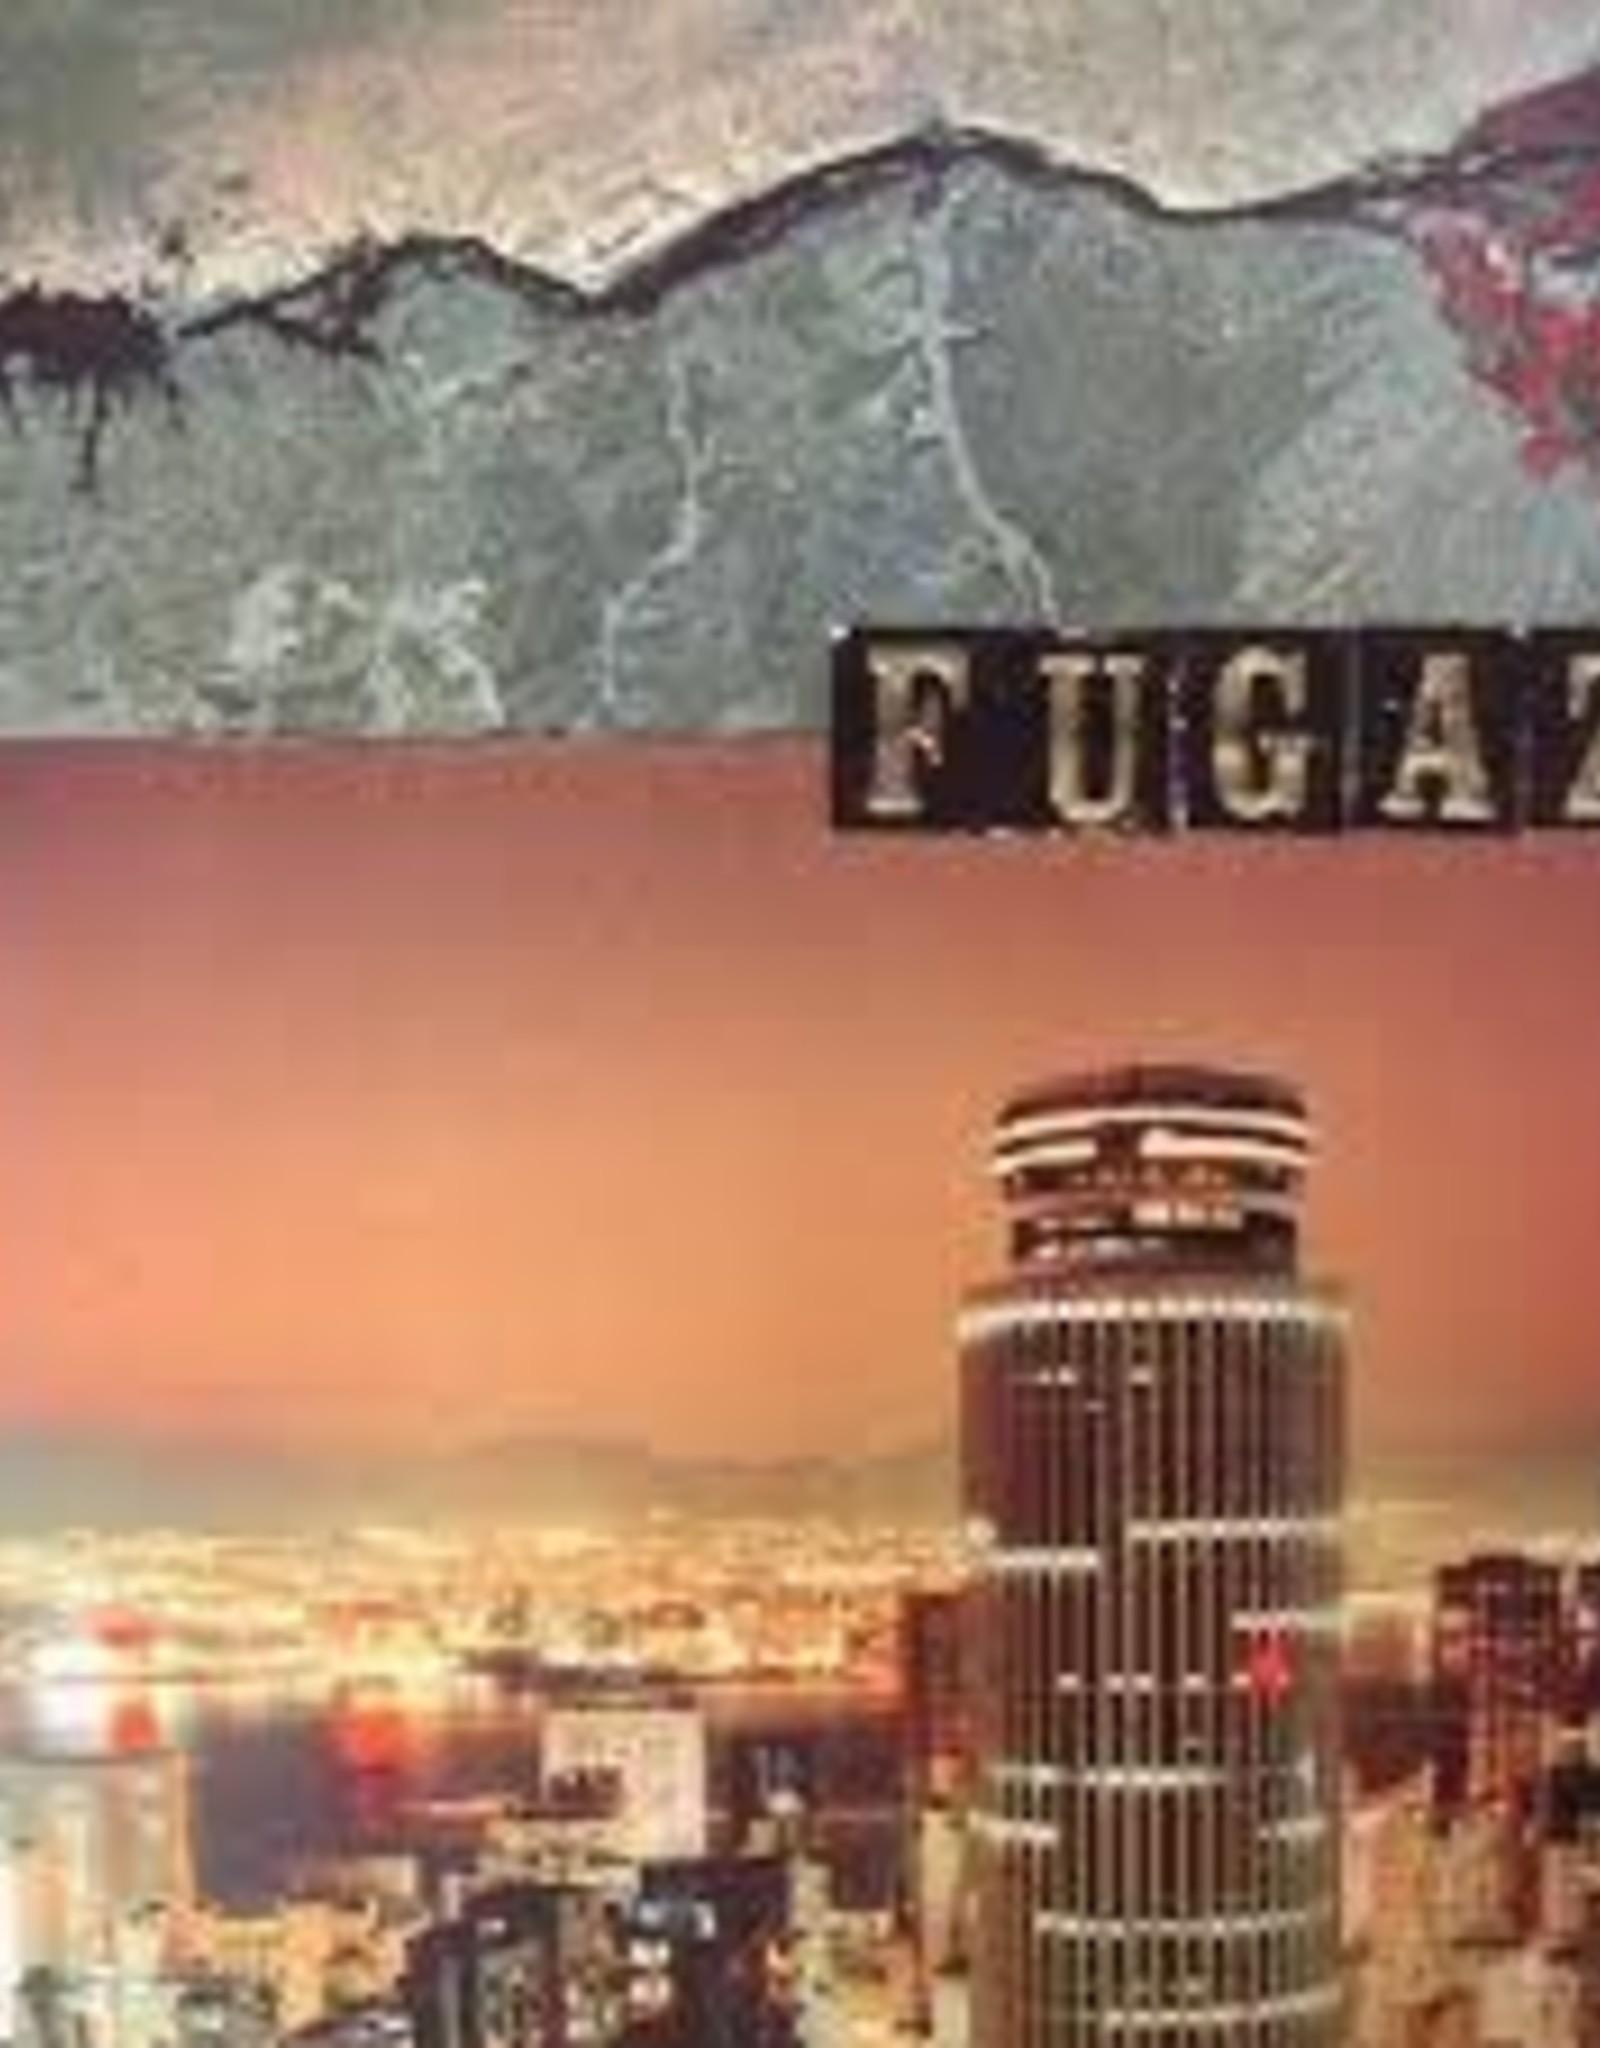 Fugazi - End Hits